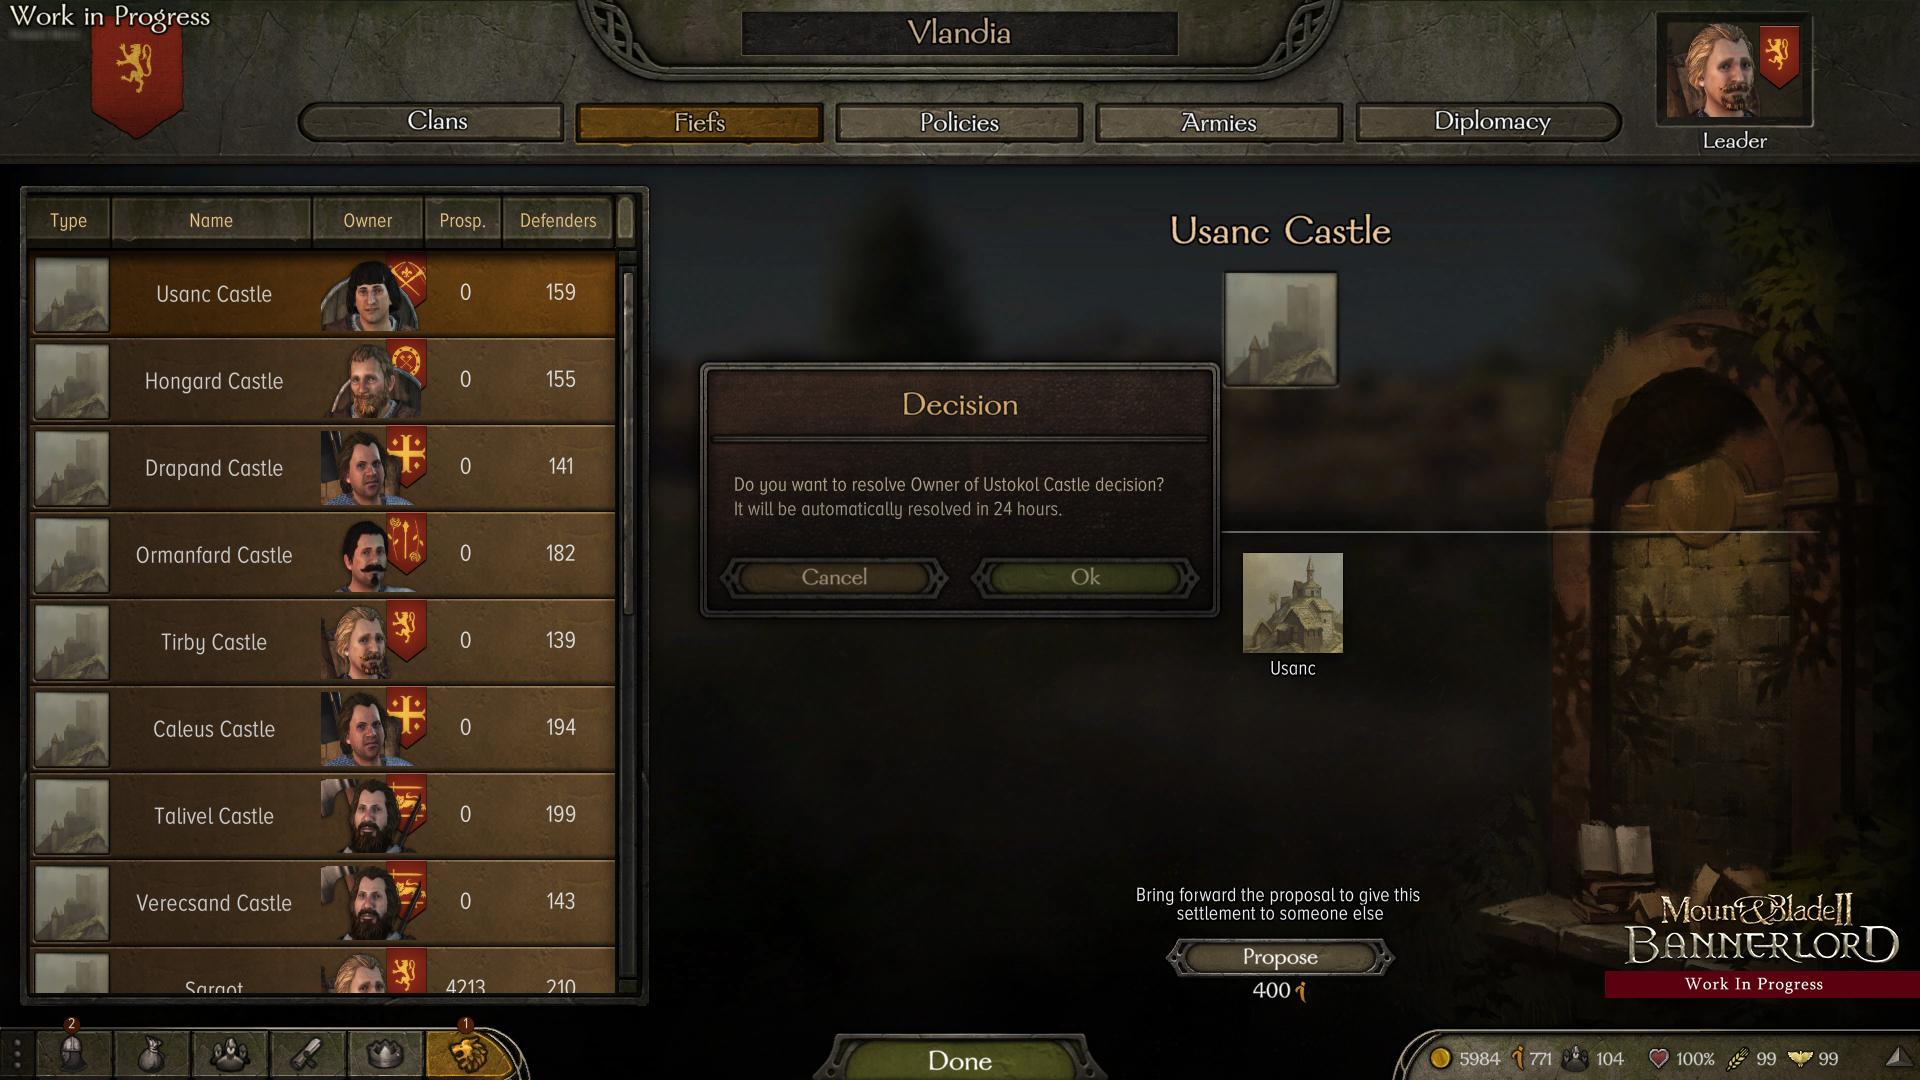 Diario Semanal de desarrollo de Bannerlord 112: Decisiones del reino. C2d4f9dcd1c0f2e4777e4945a2bfb14ecef2b49f